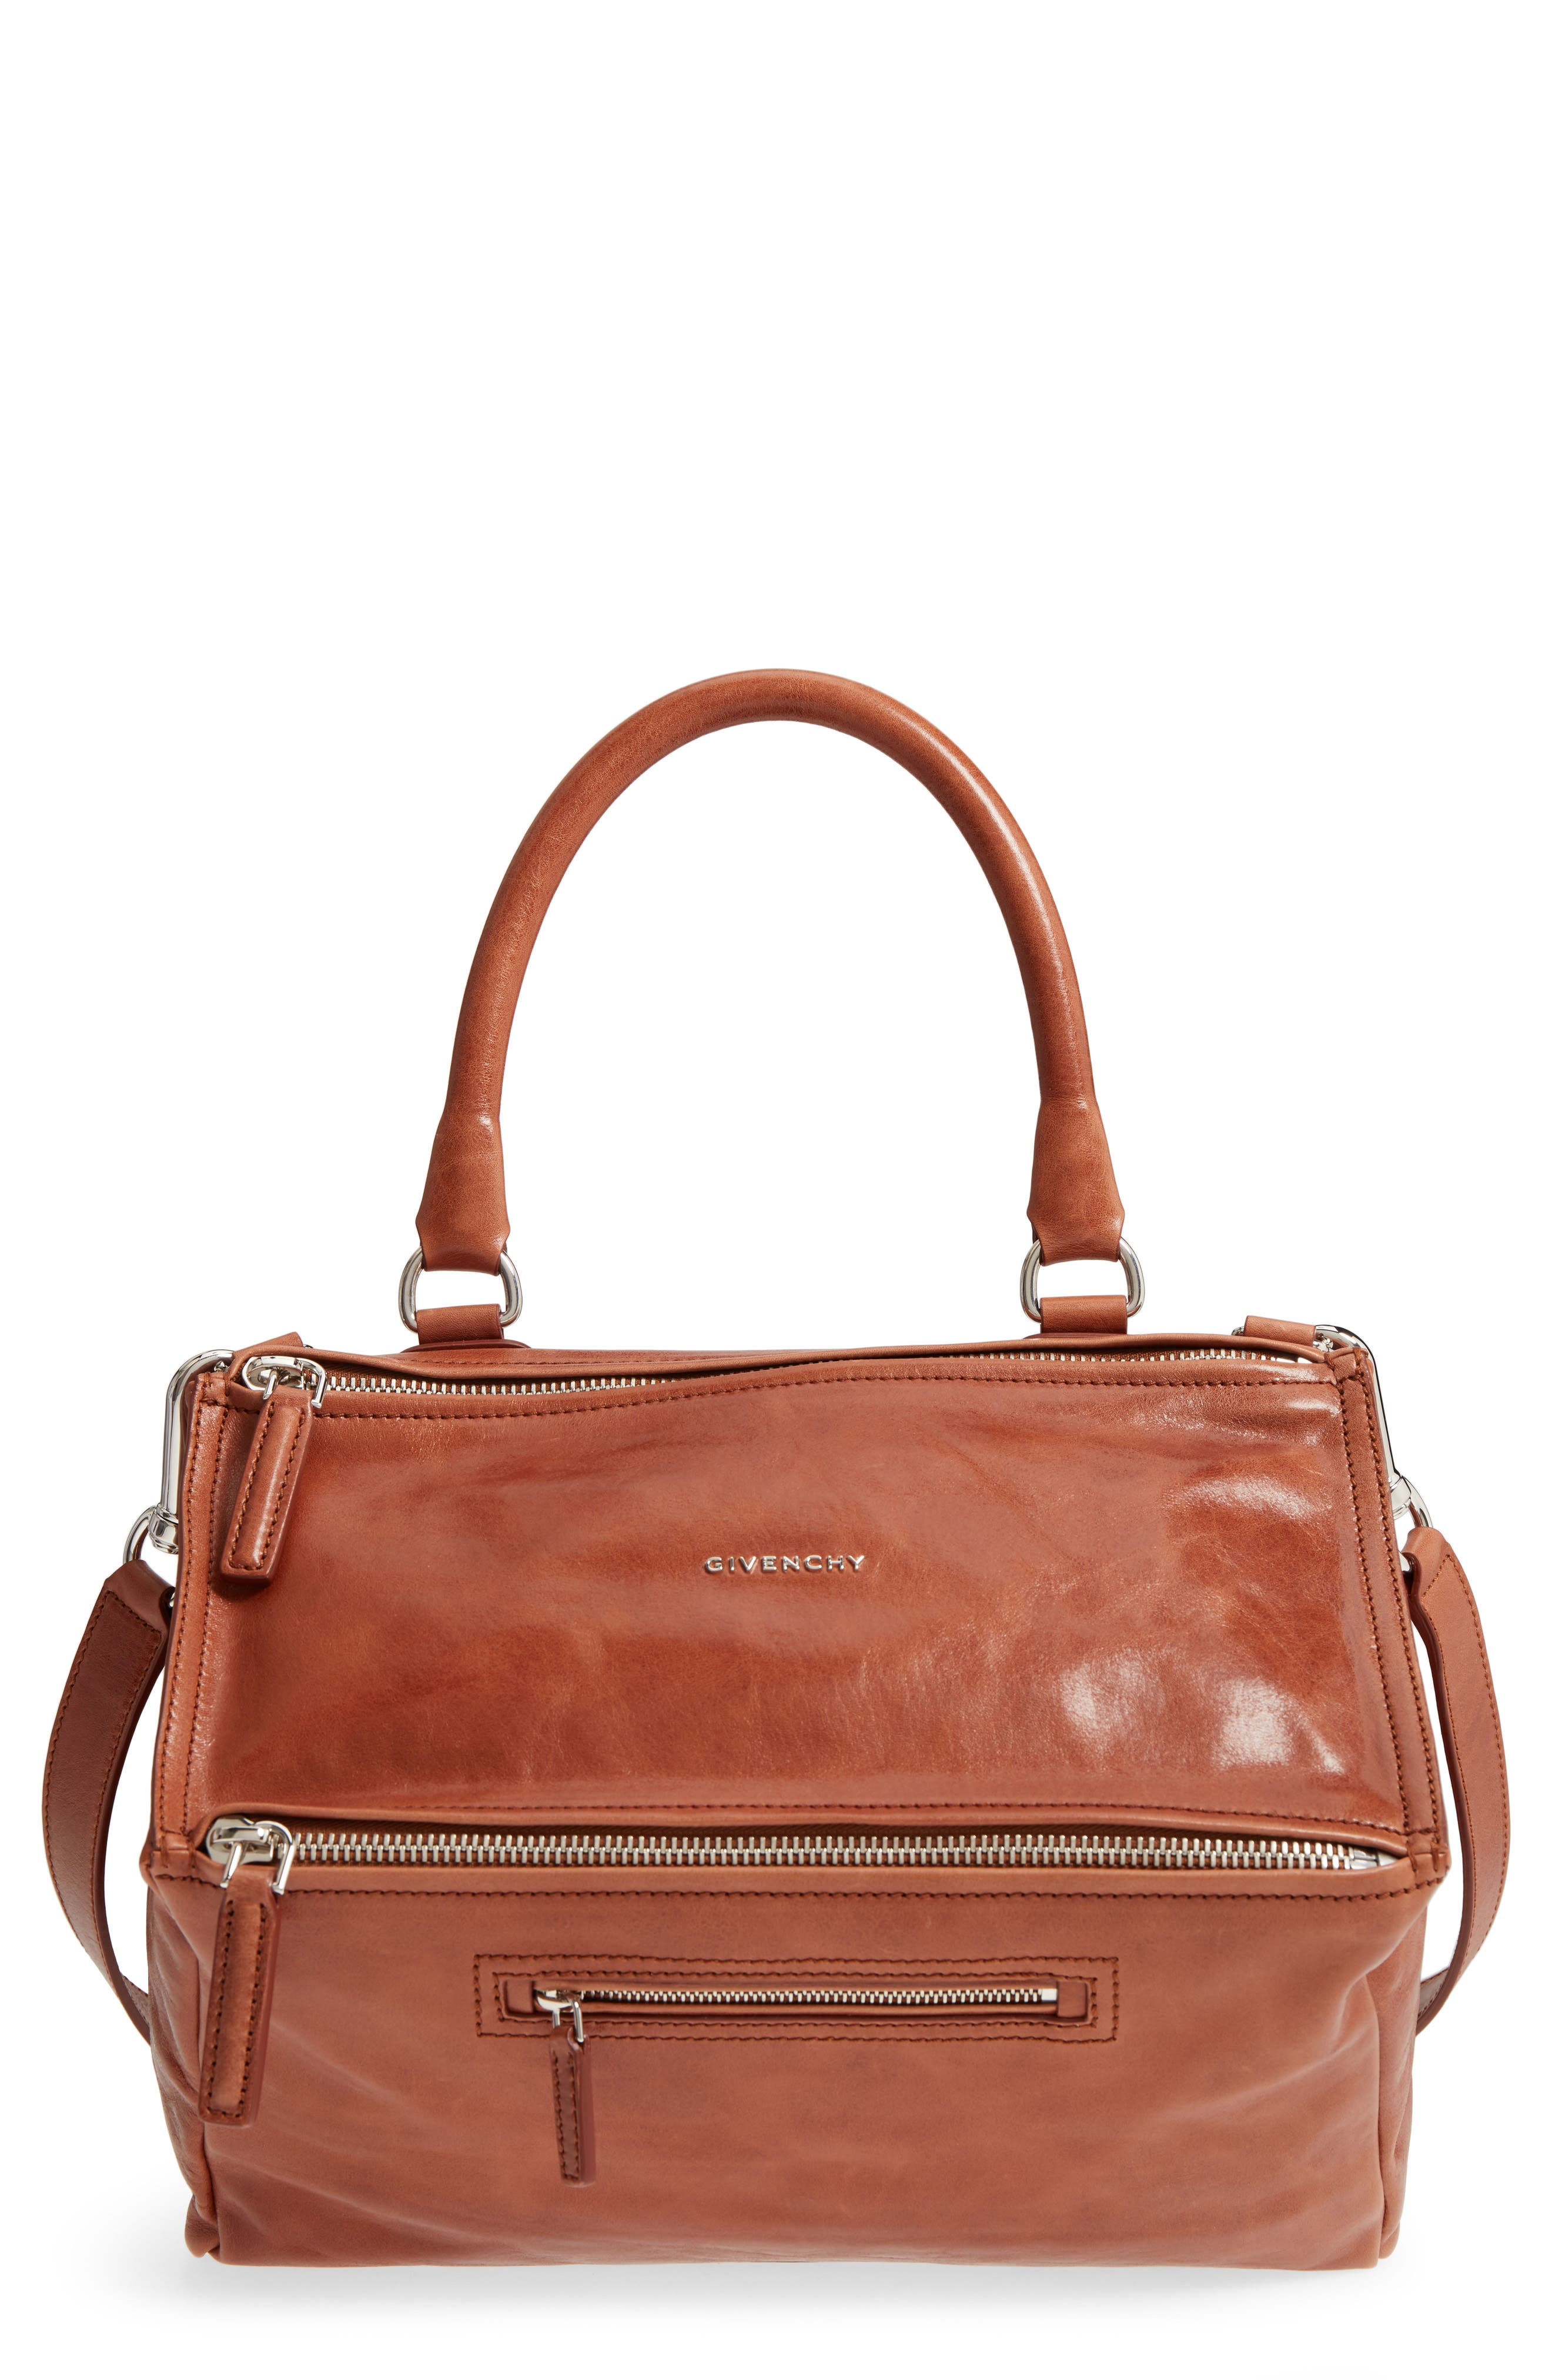 Medium Pandora Shiny Aged Leather Satchel,                         Main,                         color, Cognac